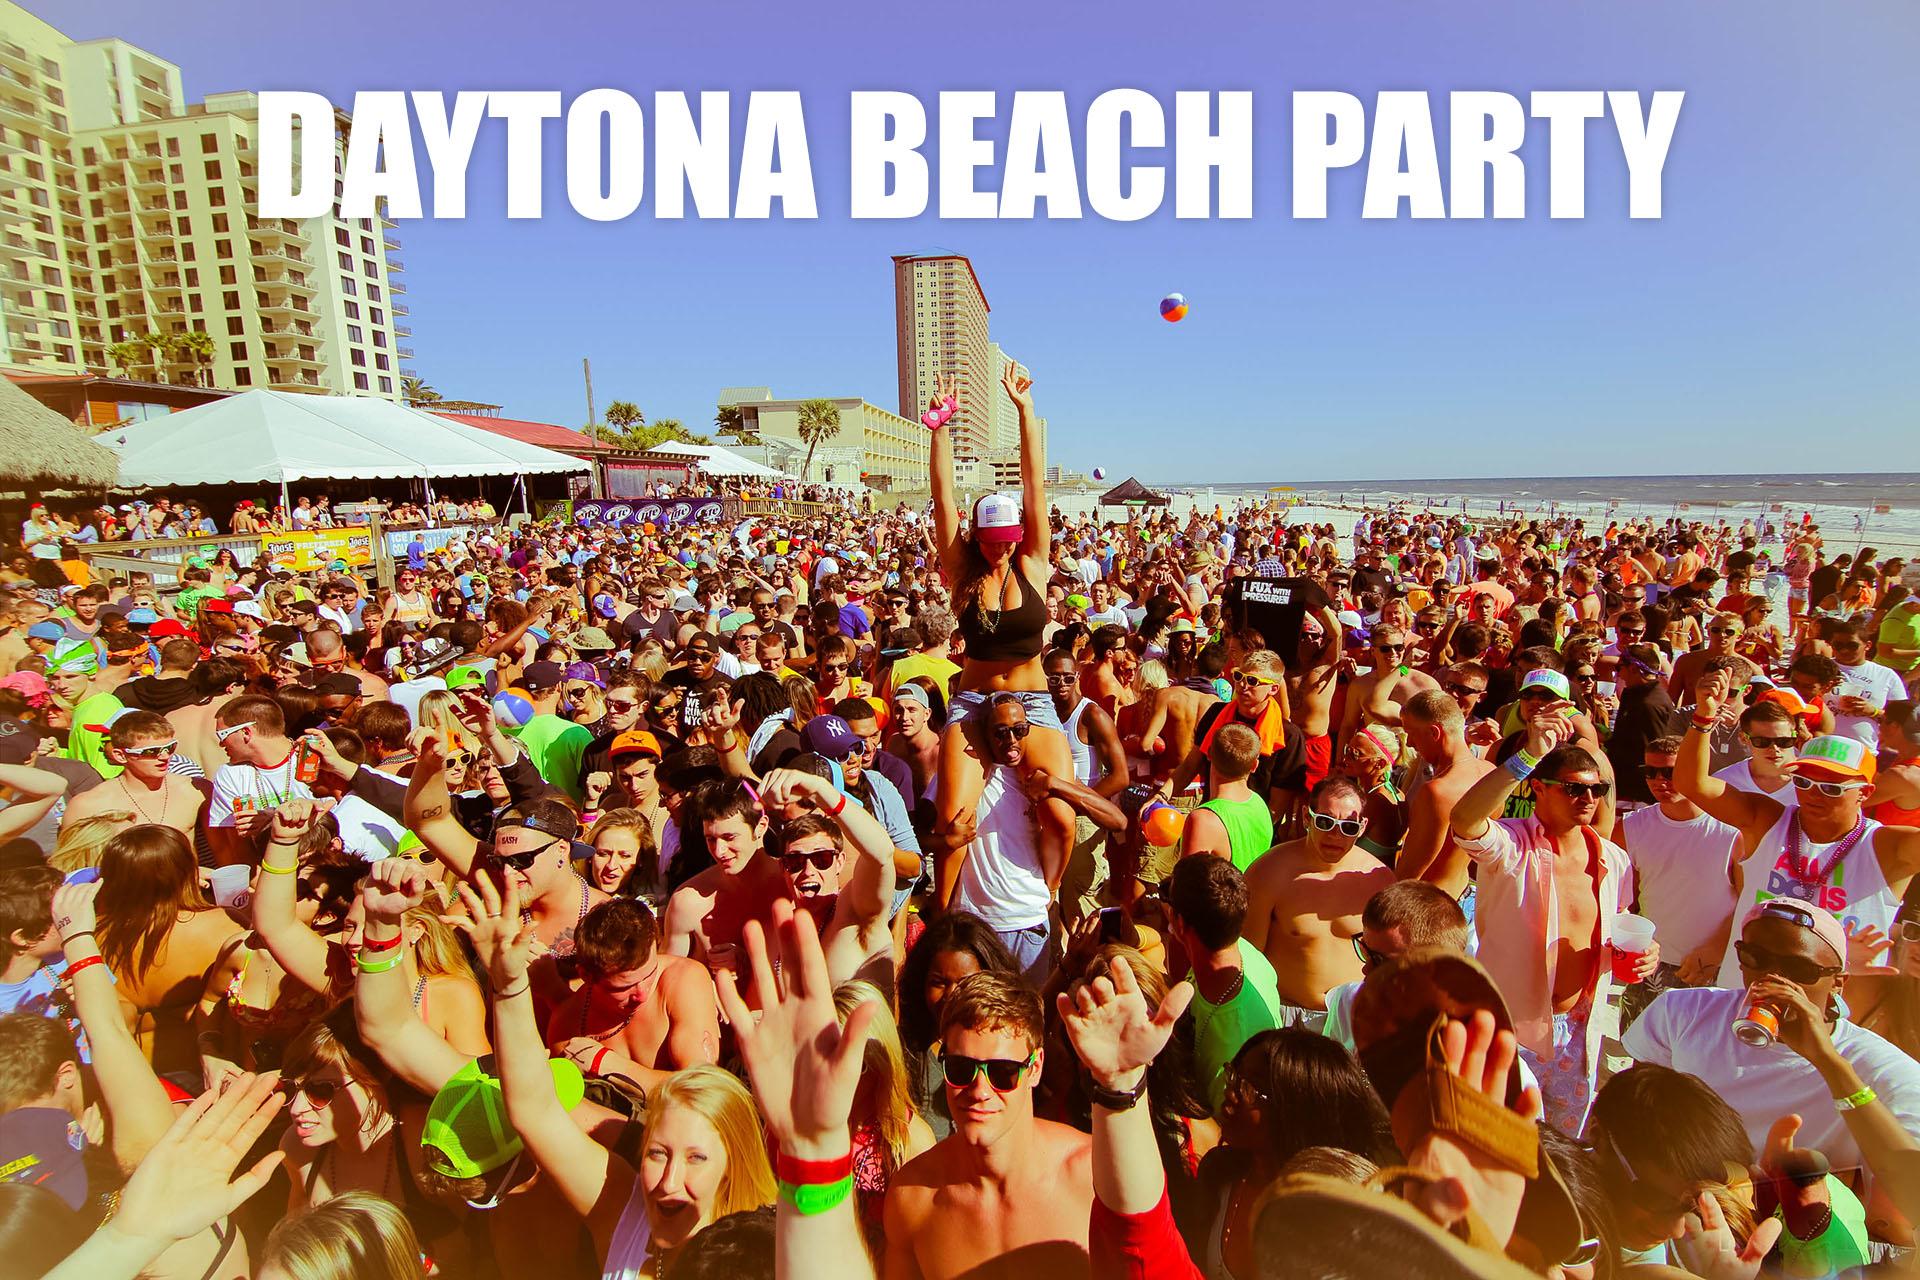 Daytona Beach Party HD wallpaper background 1920x1280